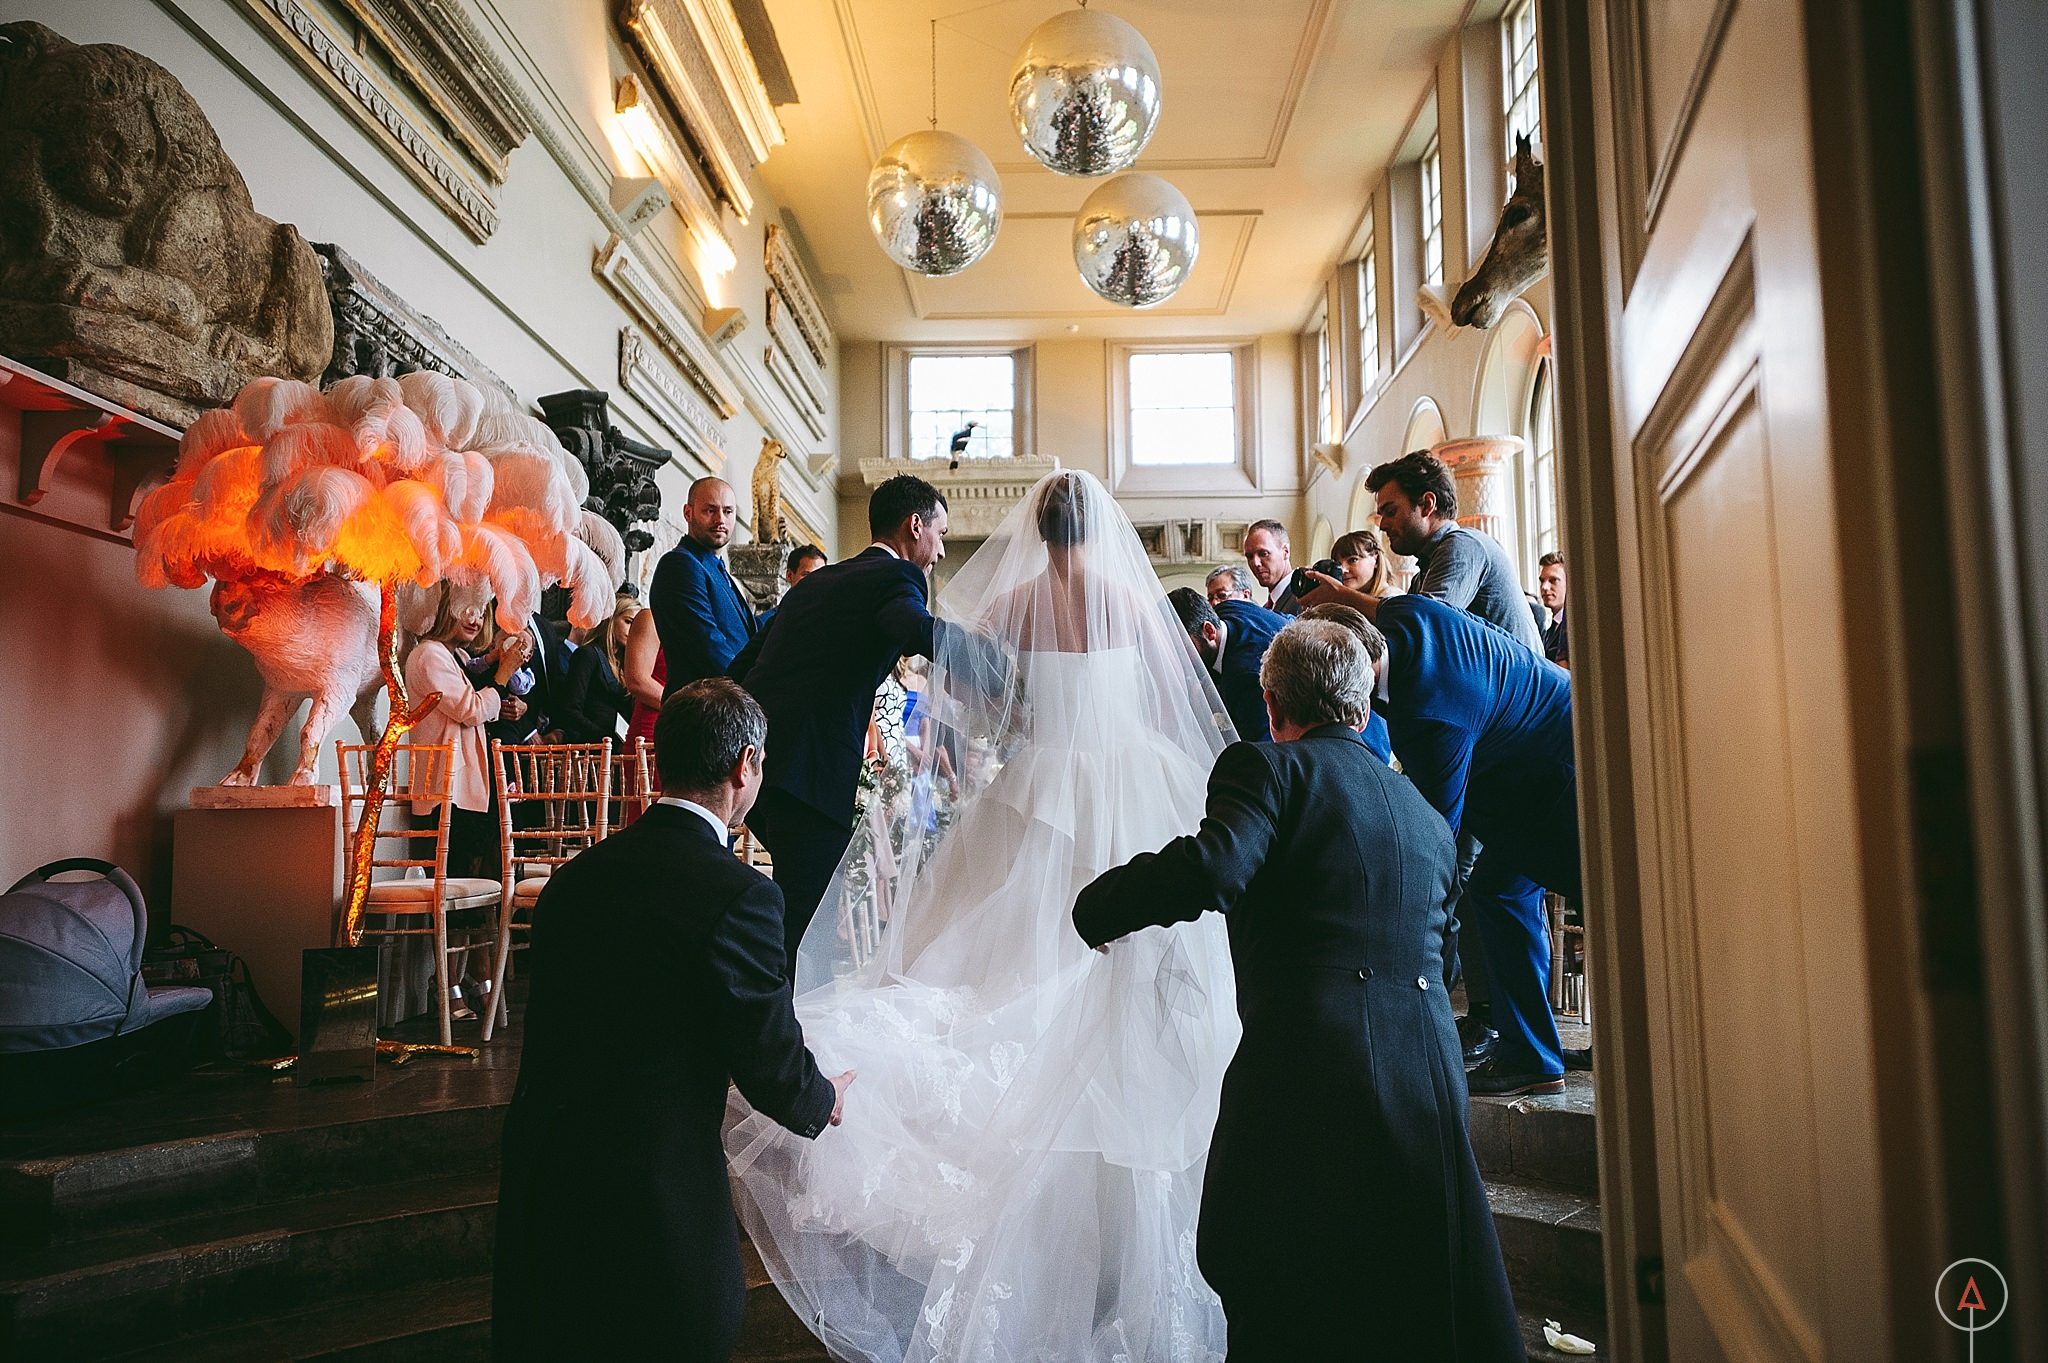 cardiff-wedding-photographer-aga-tomaszek_0253